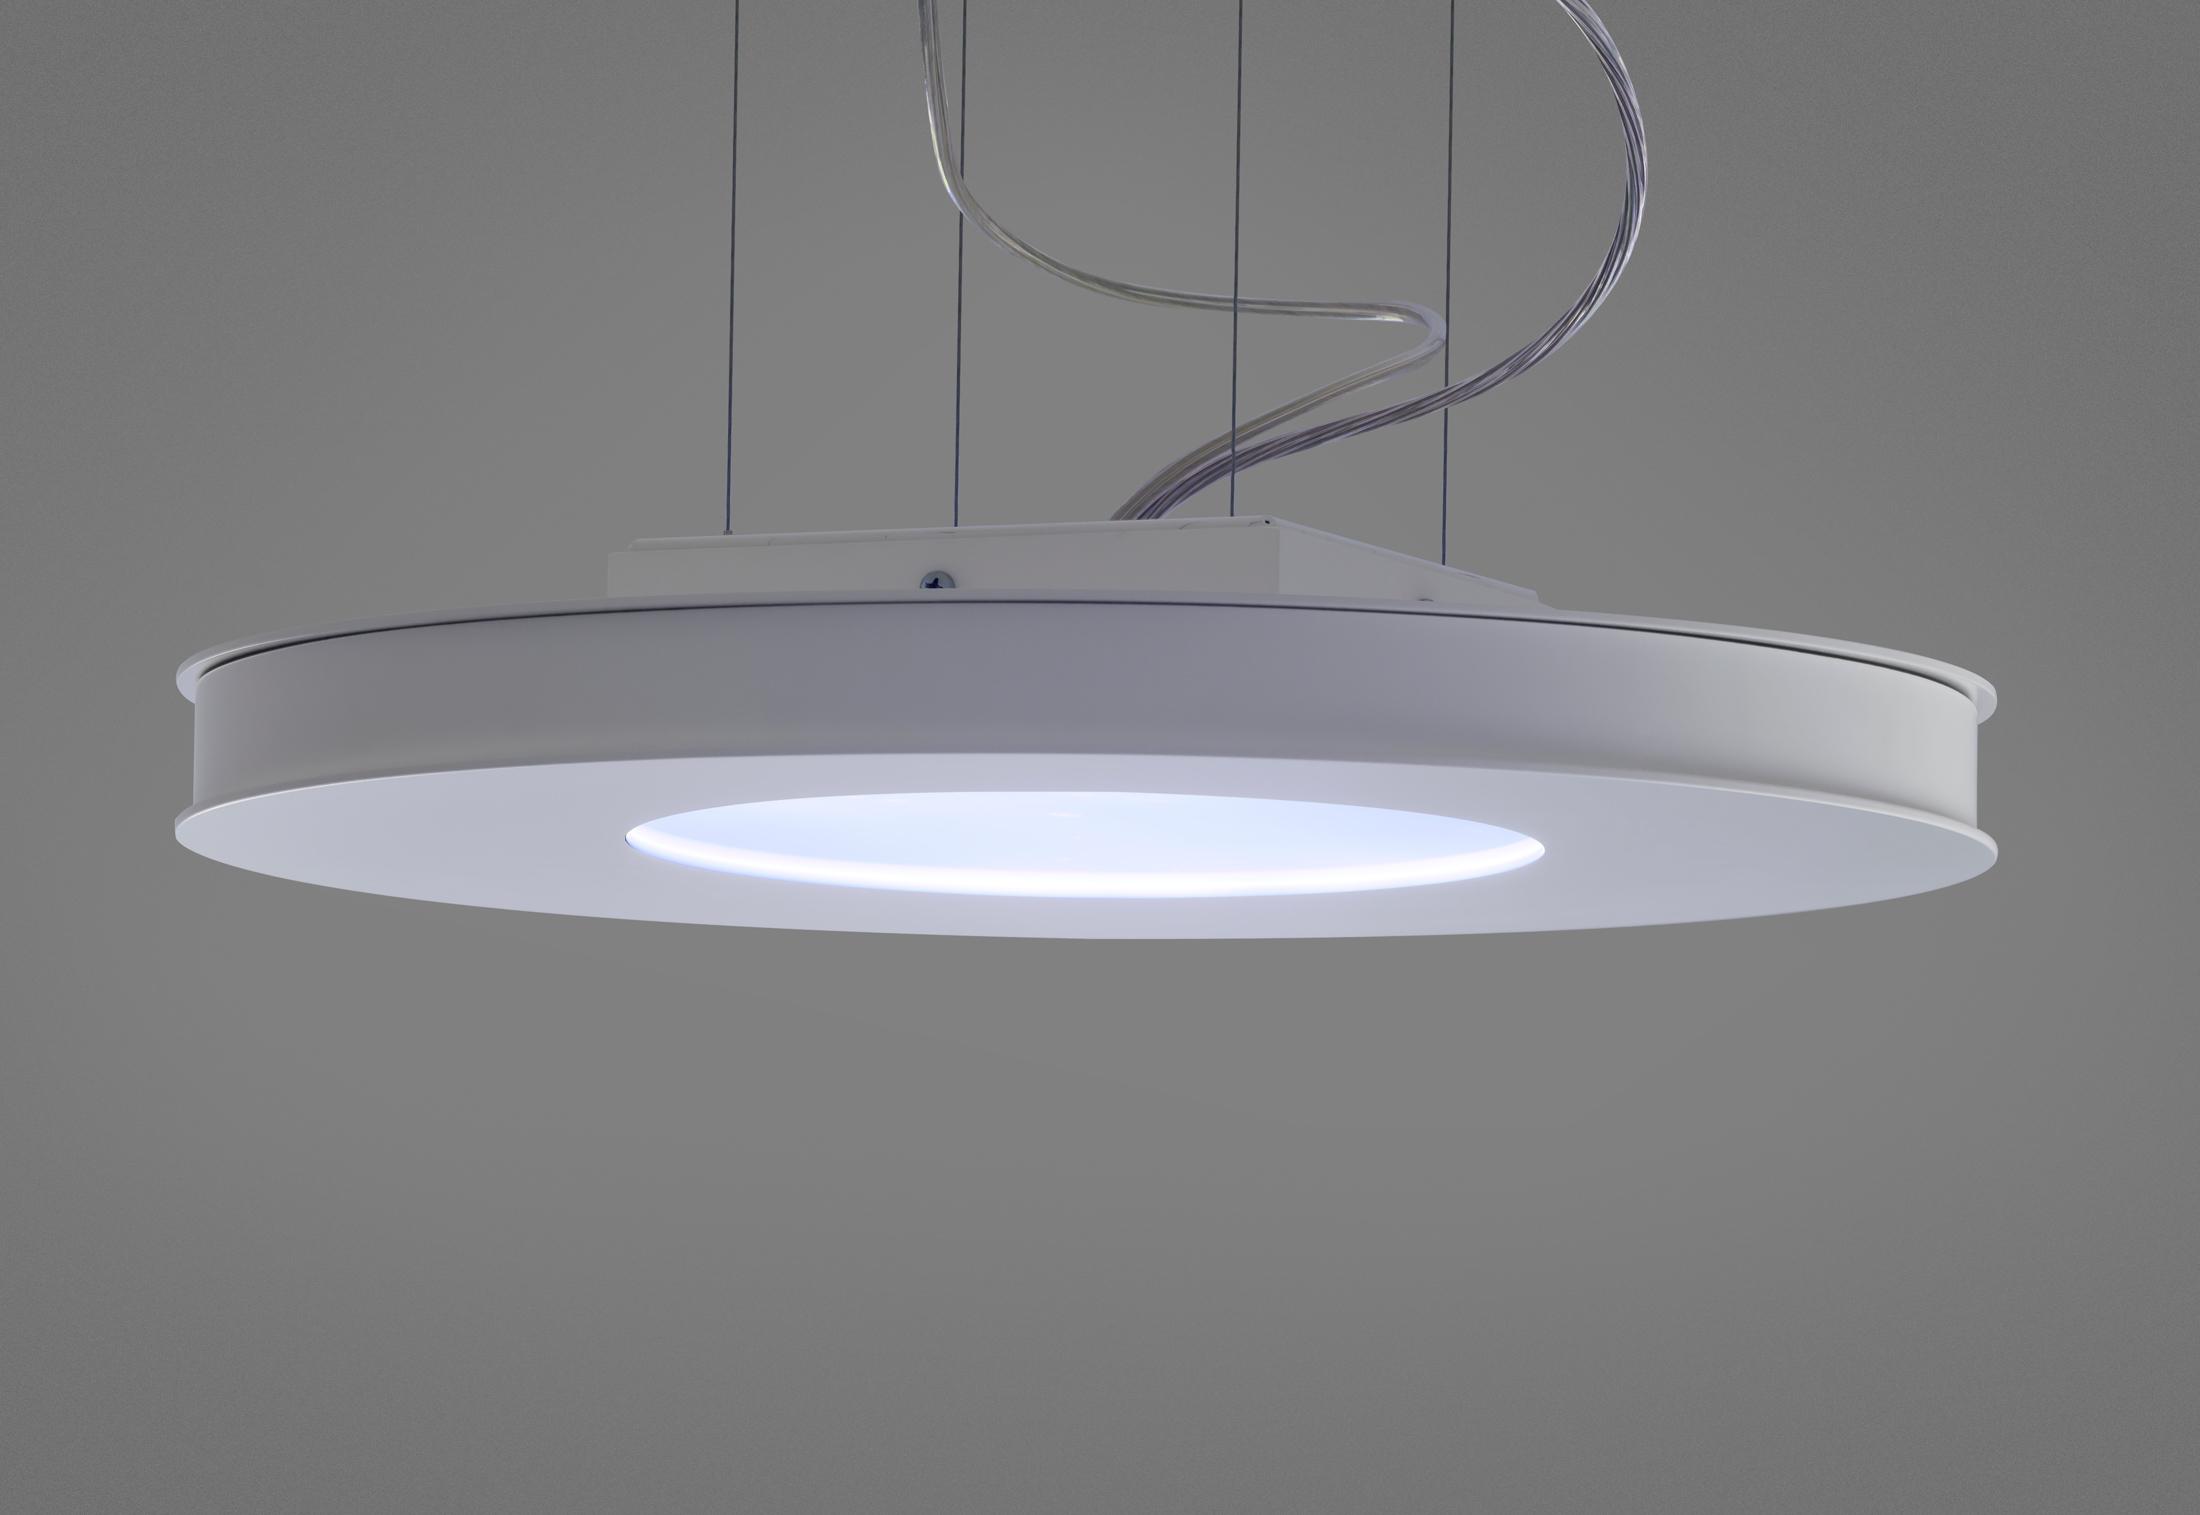 Led around pendant luminaire by ado lights stylepark led around pendant luminaire aloadofball Gallery